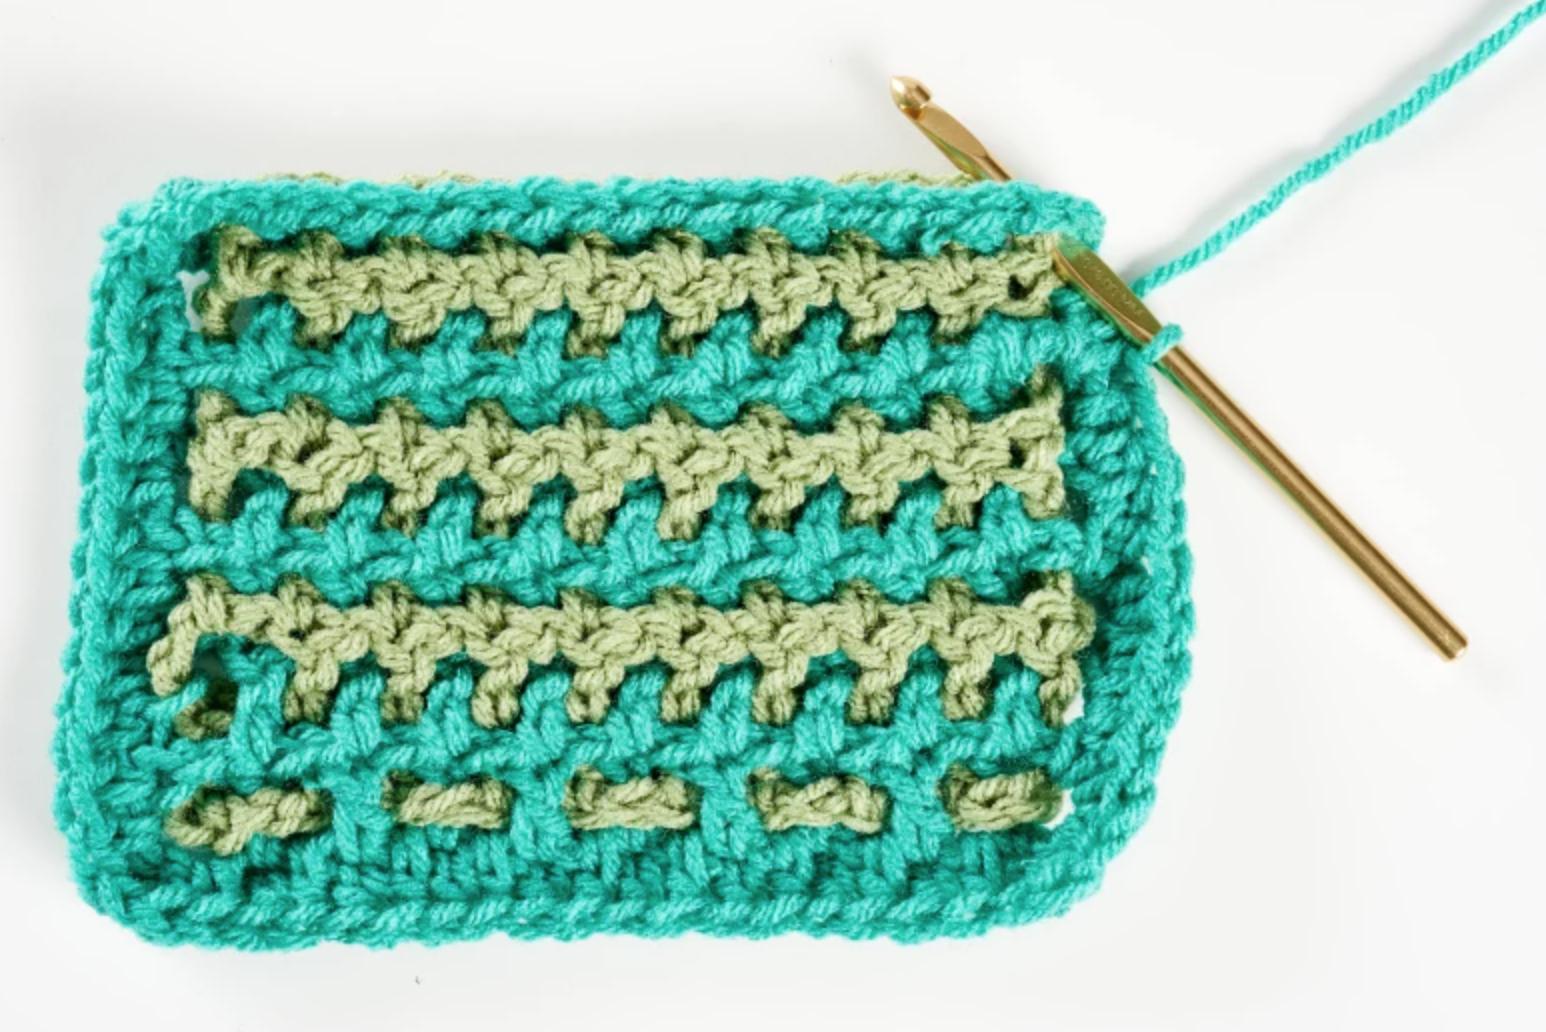 interwoven crochet stitch